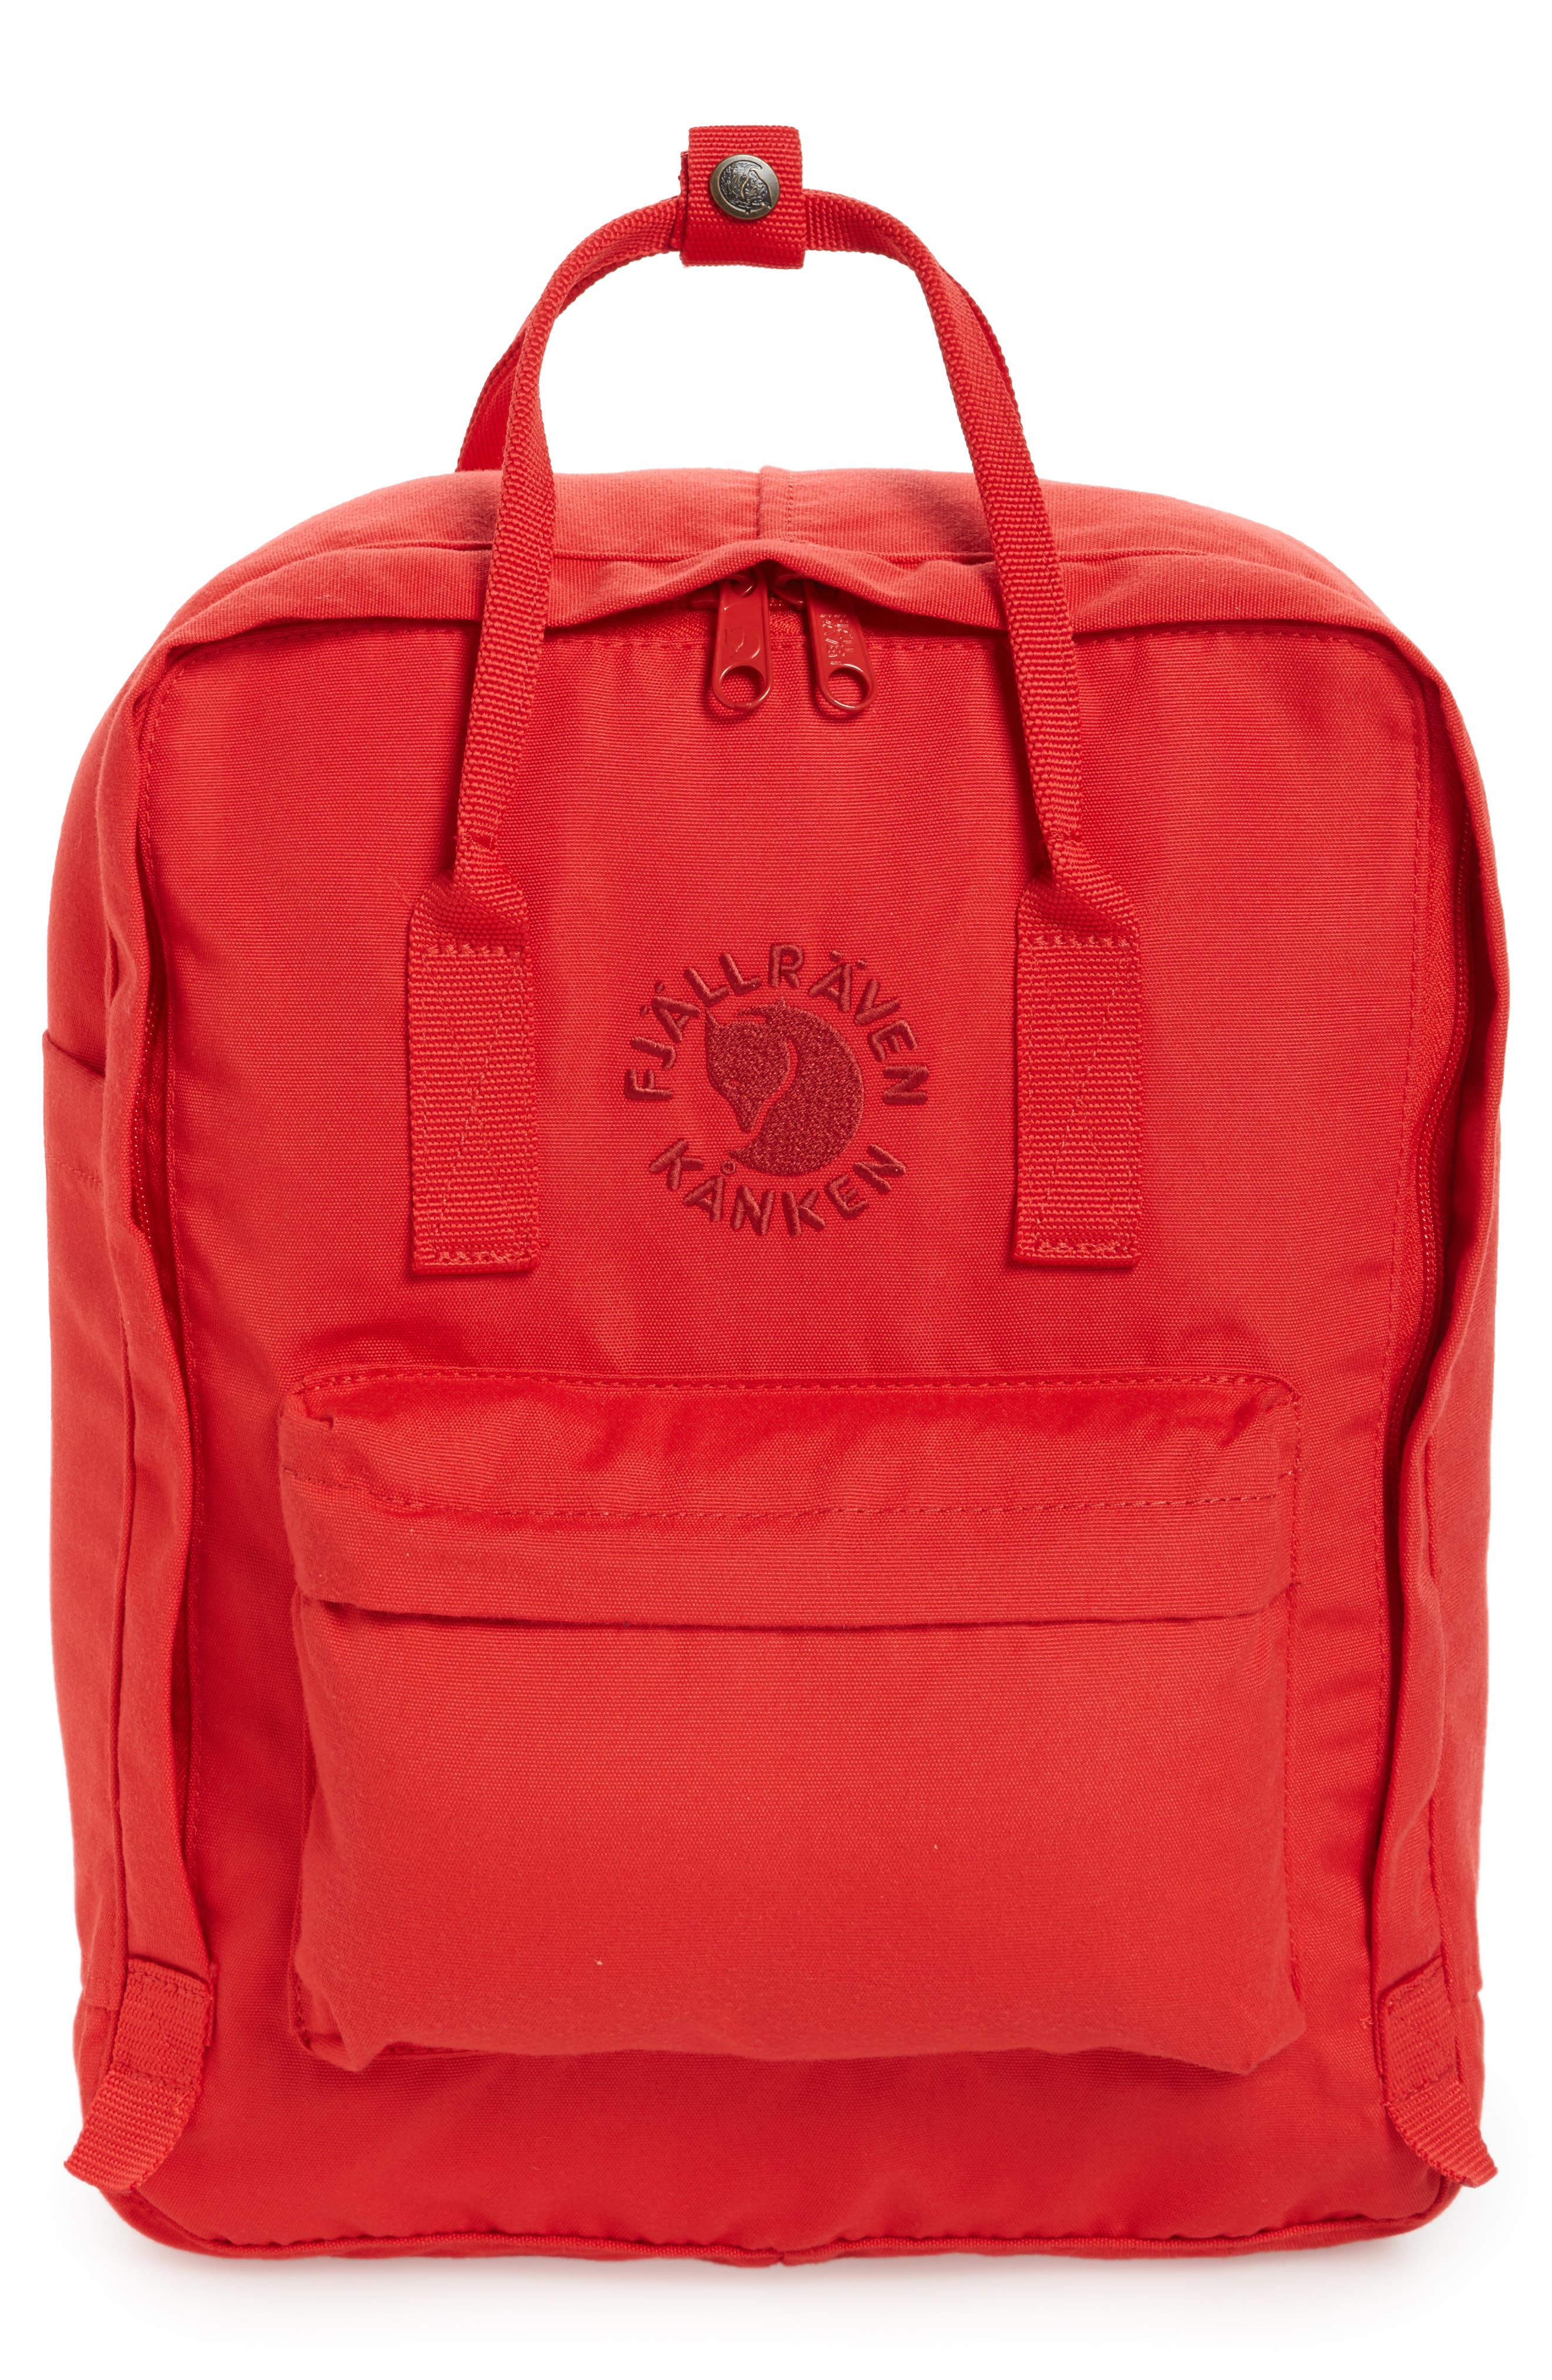 Re-Kånken Water Resistant Backpack,                         Main,                         color, Red